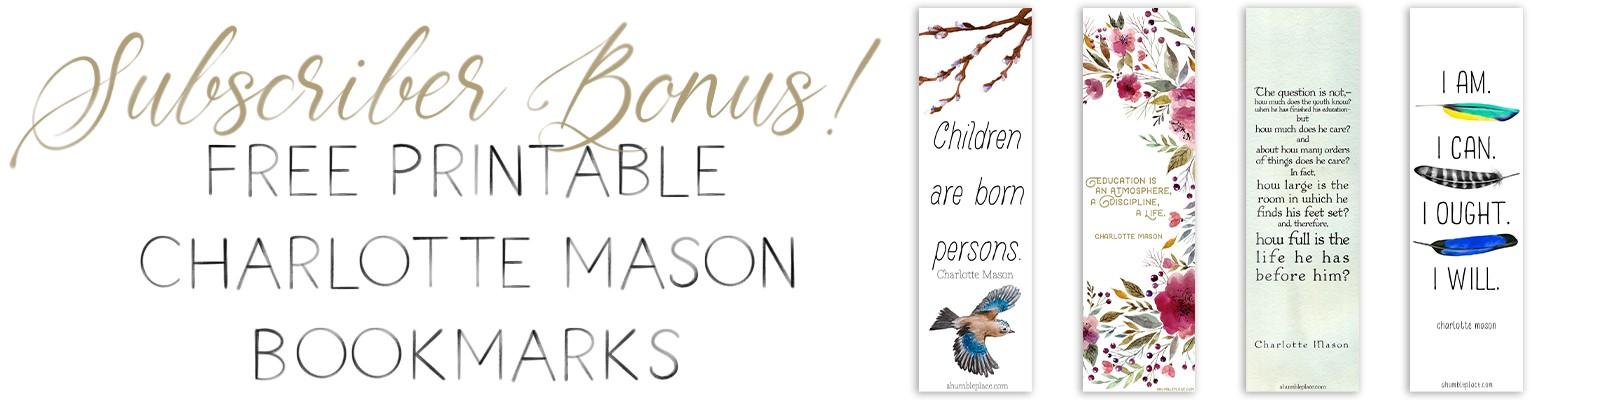 Free Printable Charlotte Mason Bookmarks